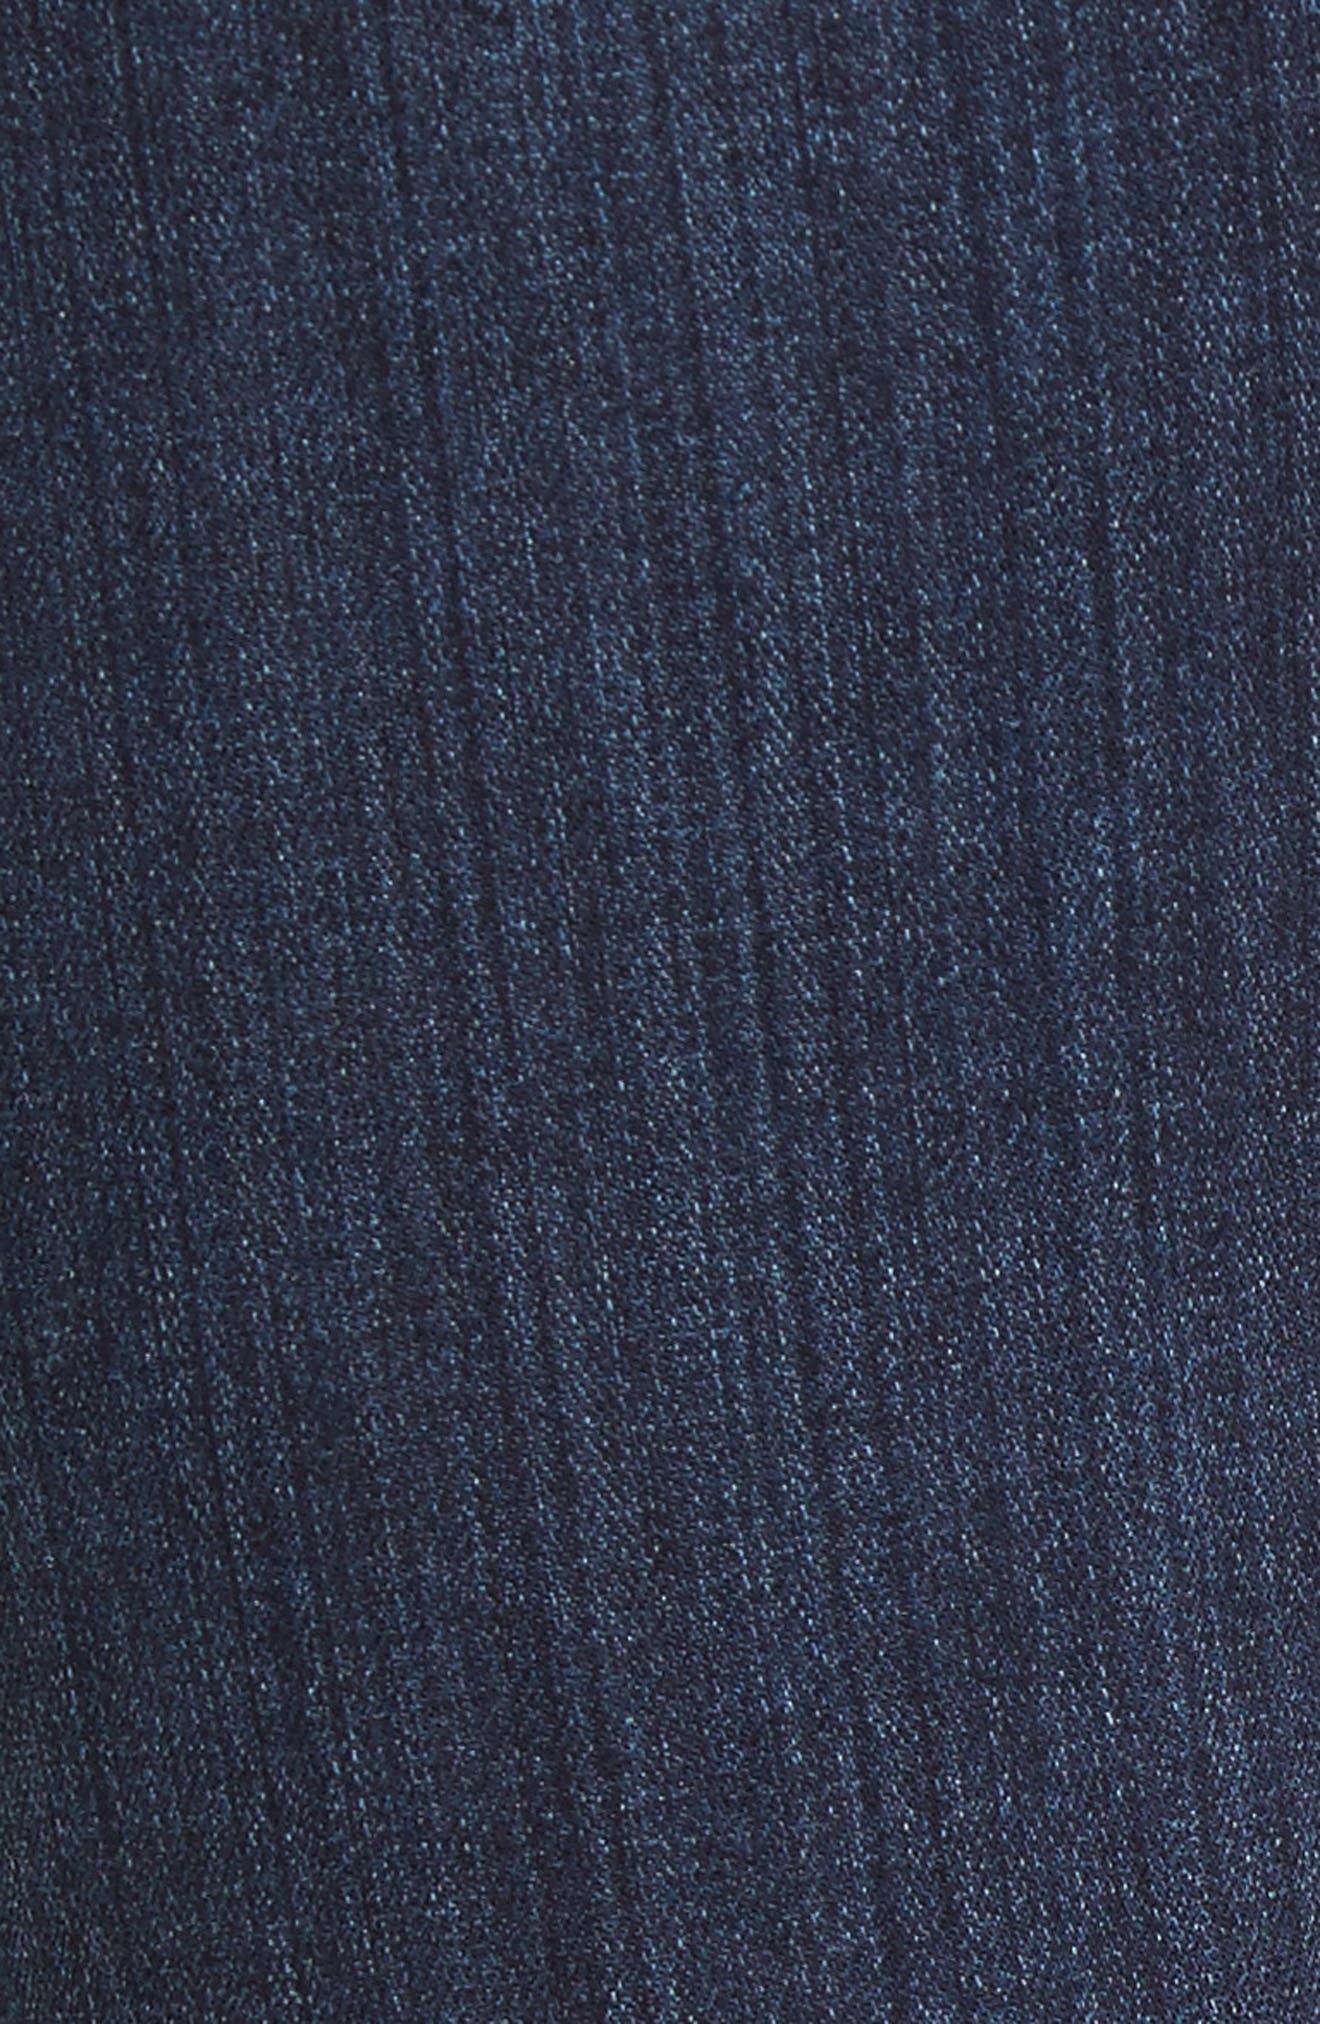 Hoxton High Waist Skinny Jeans,                             Alternate thumbnail 5, color,                             400